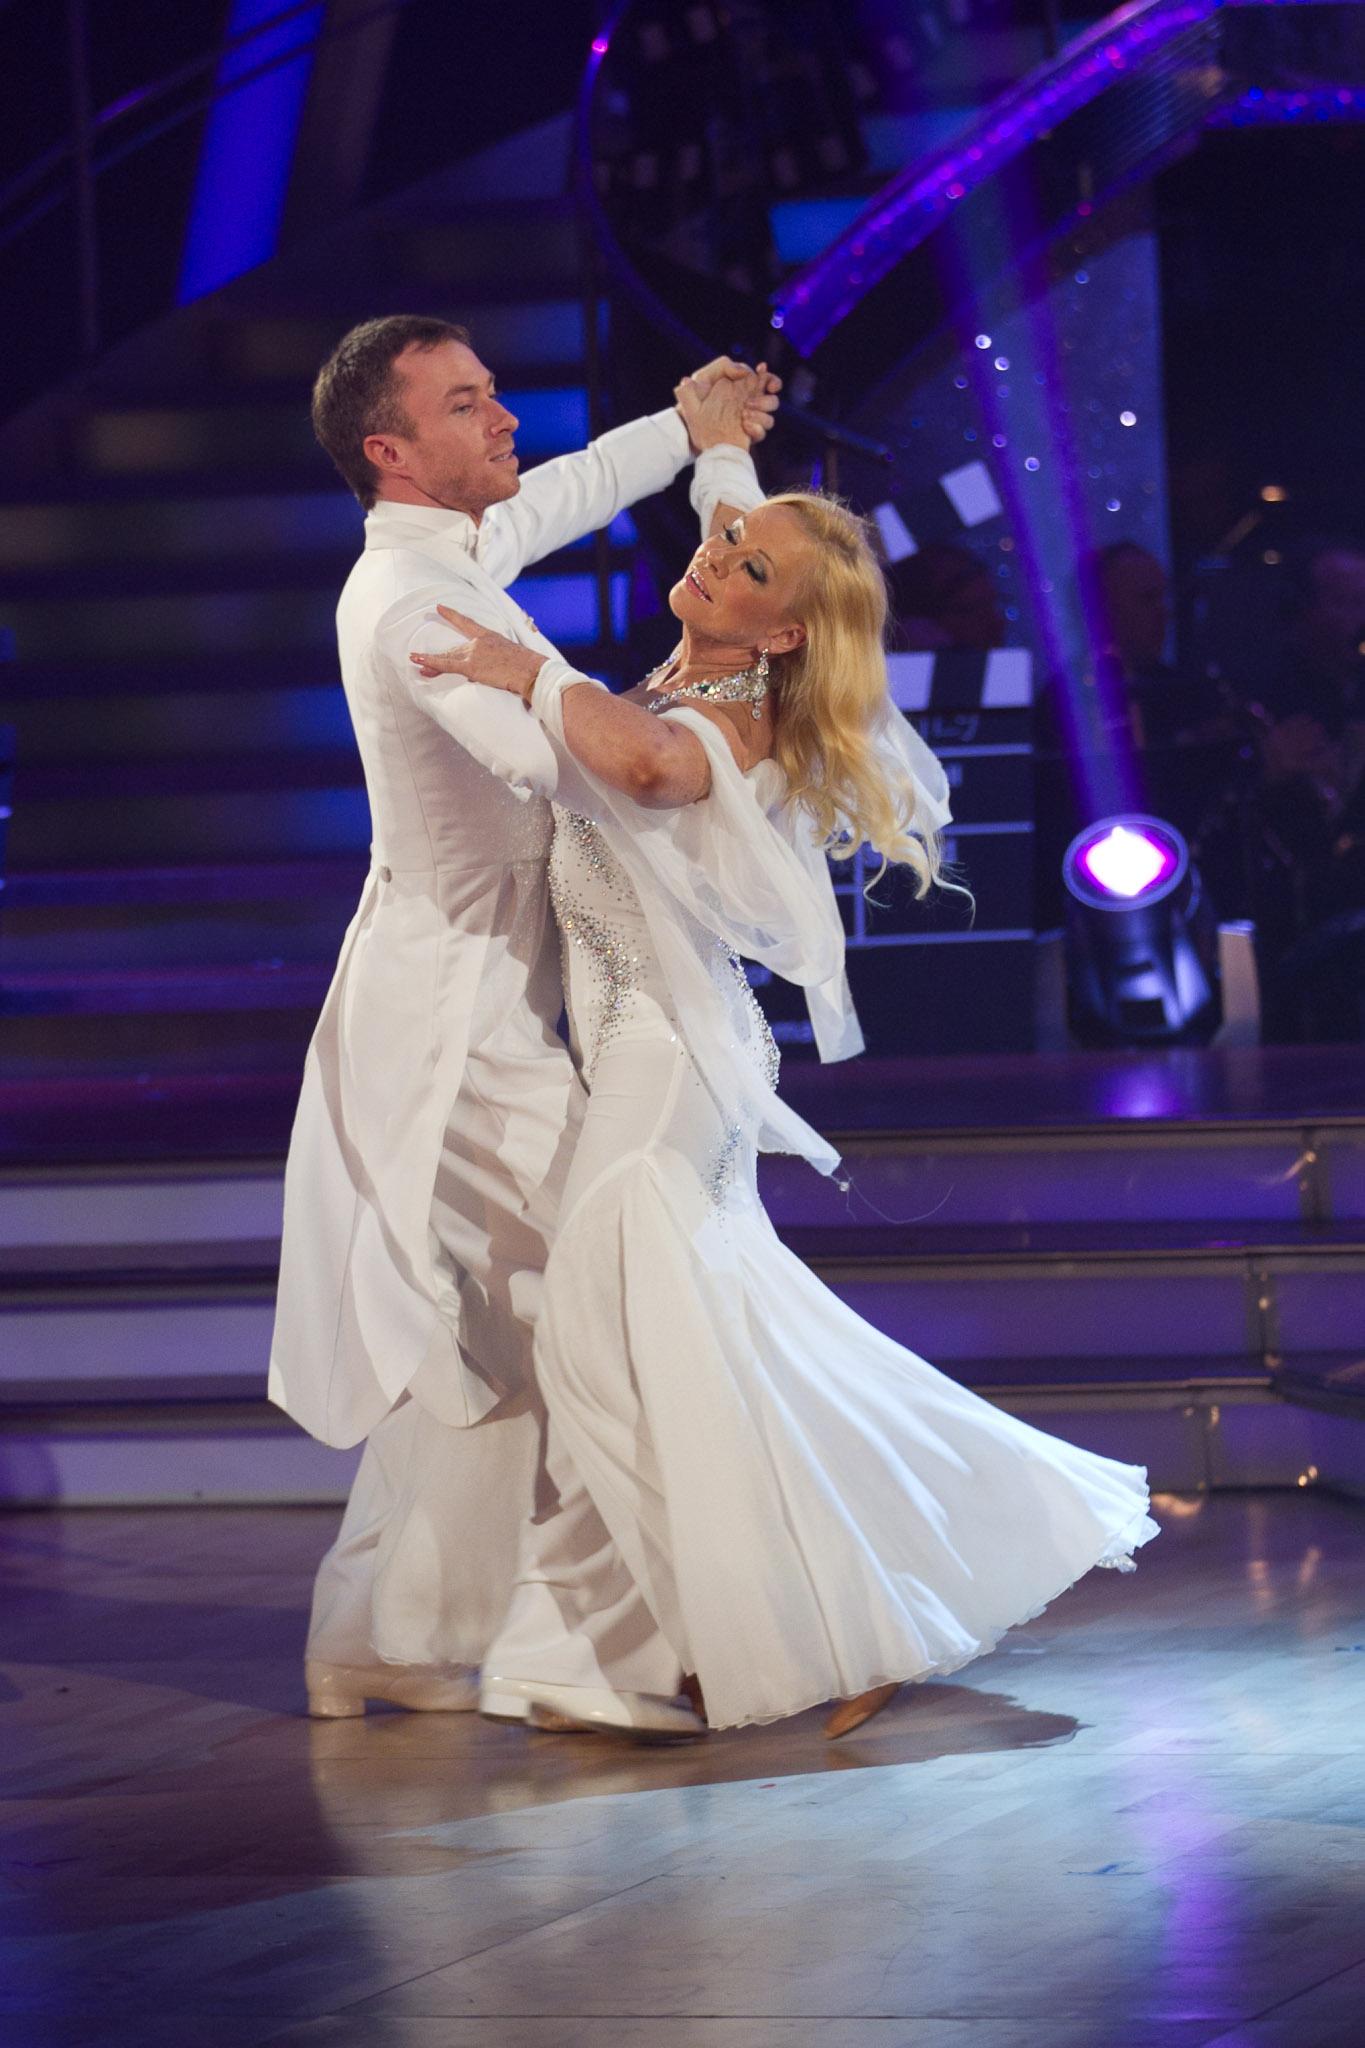 ballet news, Strictly, dance, BBC, Pamela, James